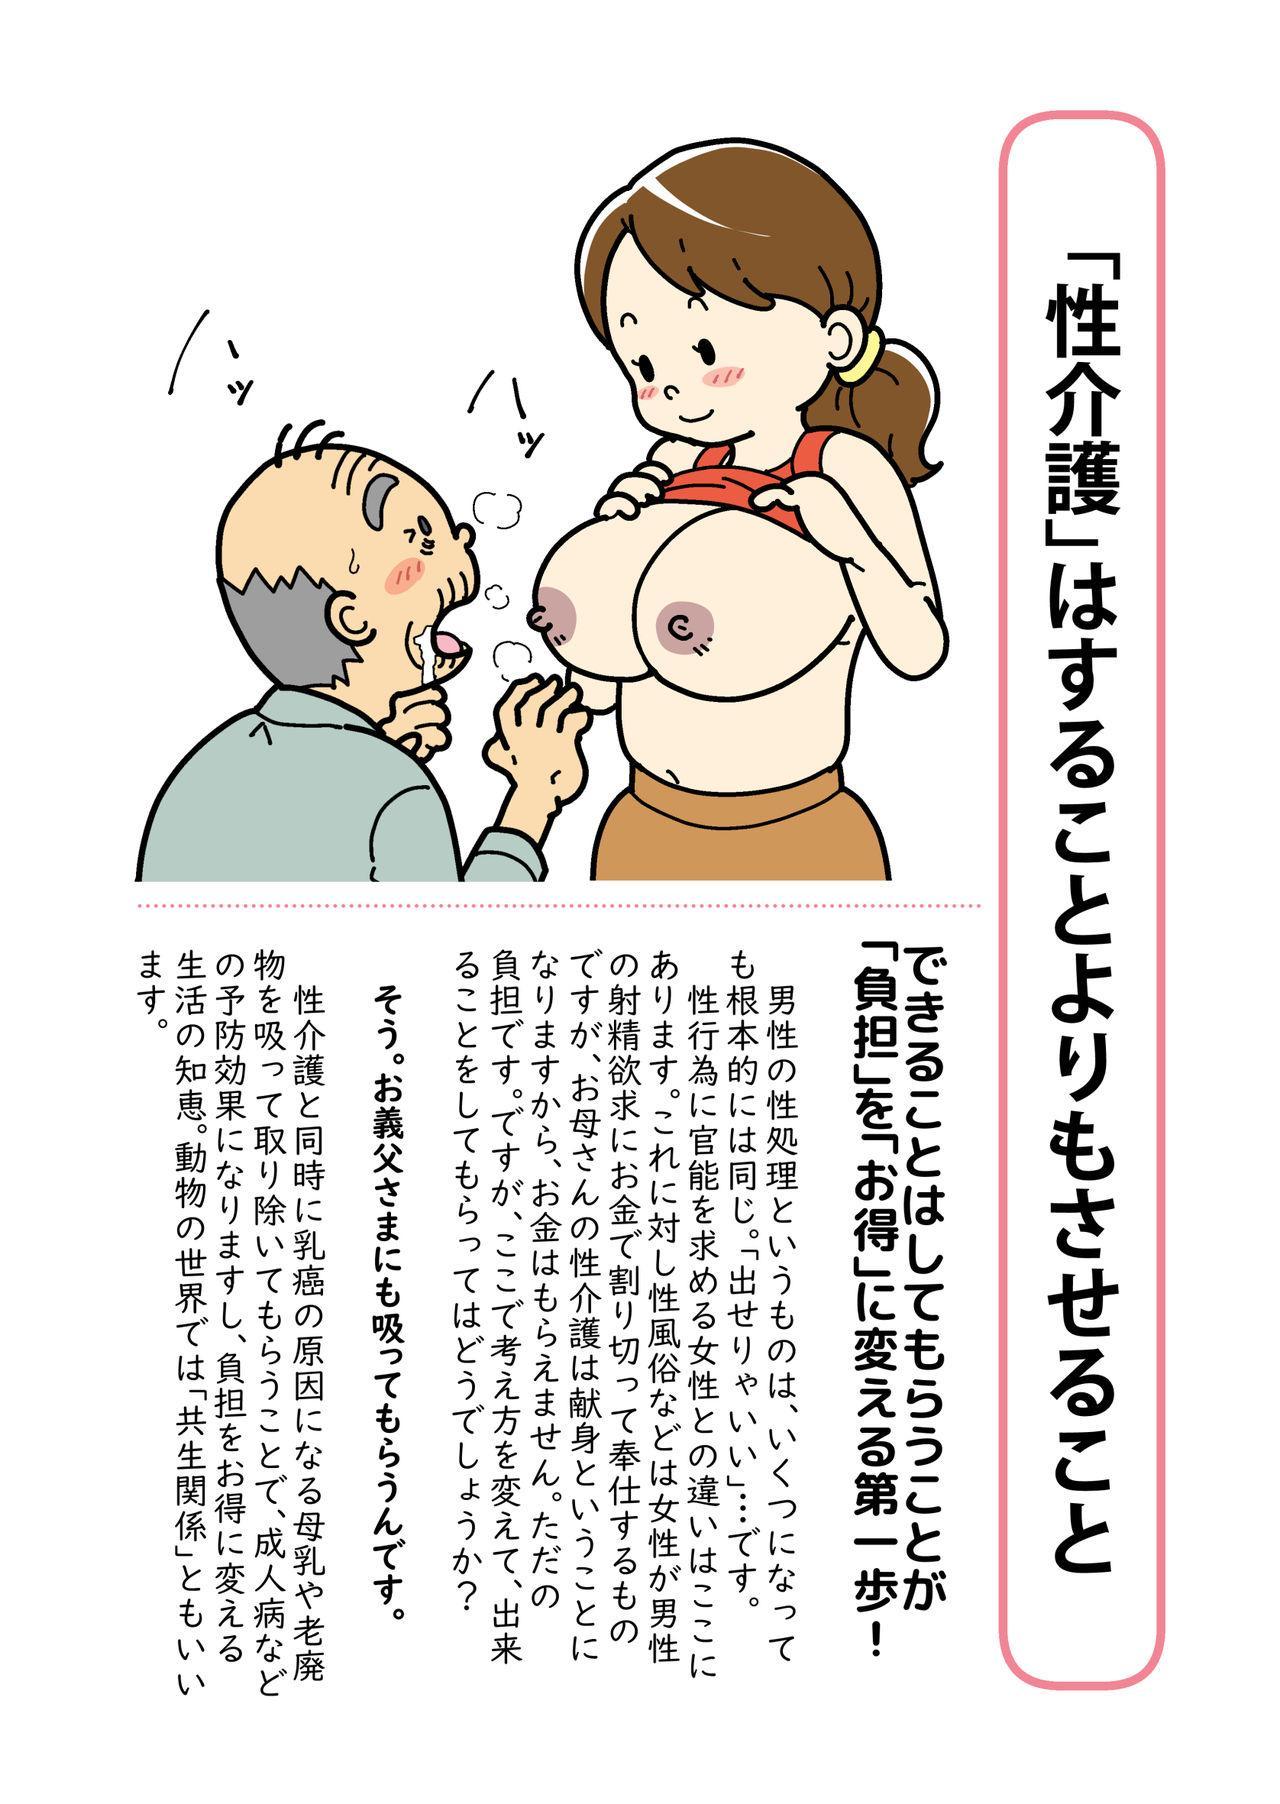 Isogasii Okaasan No Tamuno Sasa Rouzin Seikaigo | Guide for Elderly Sex Health Care to Busy Mom 9